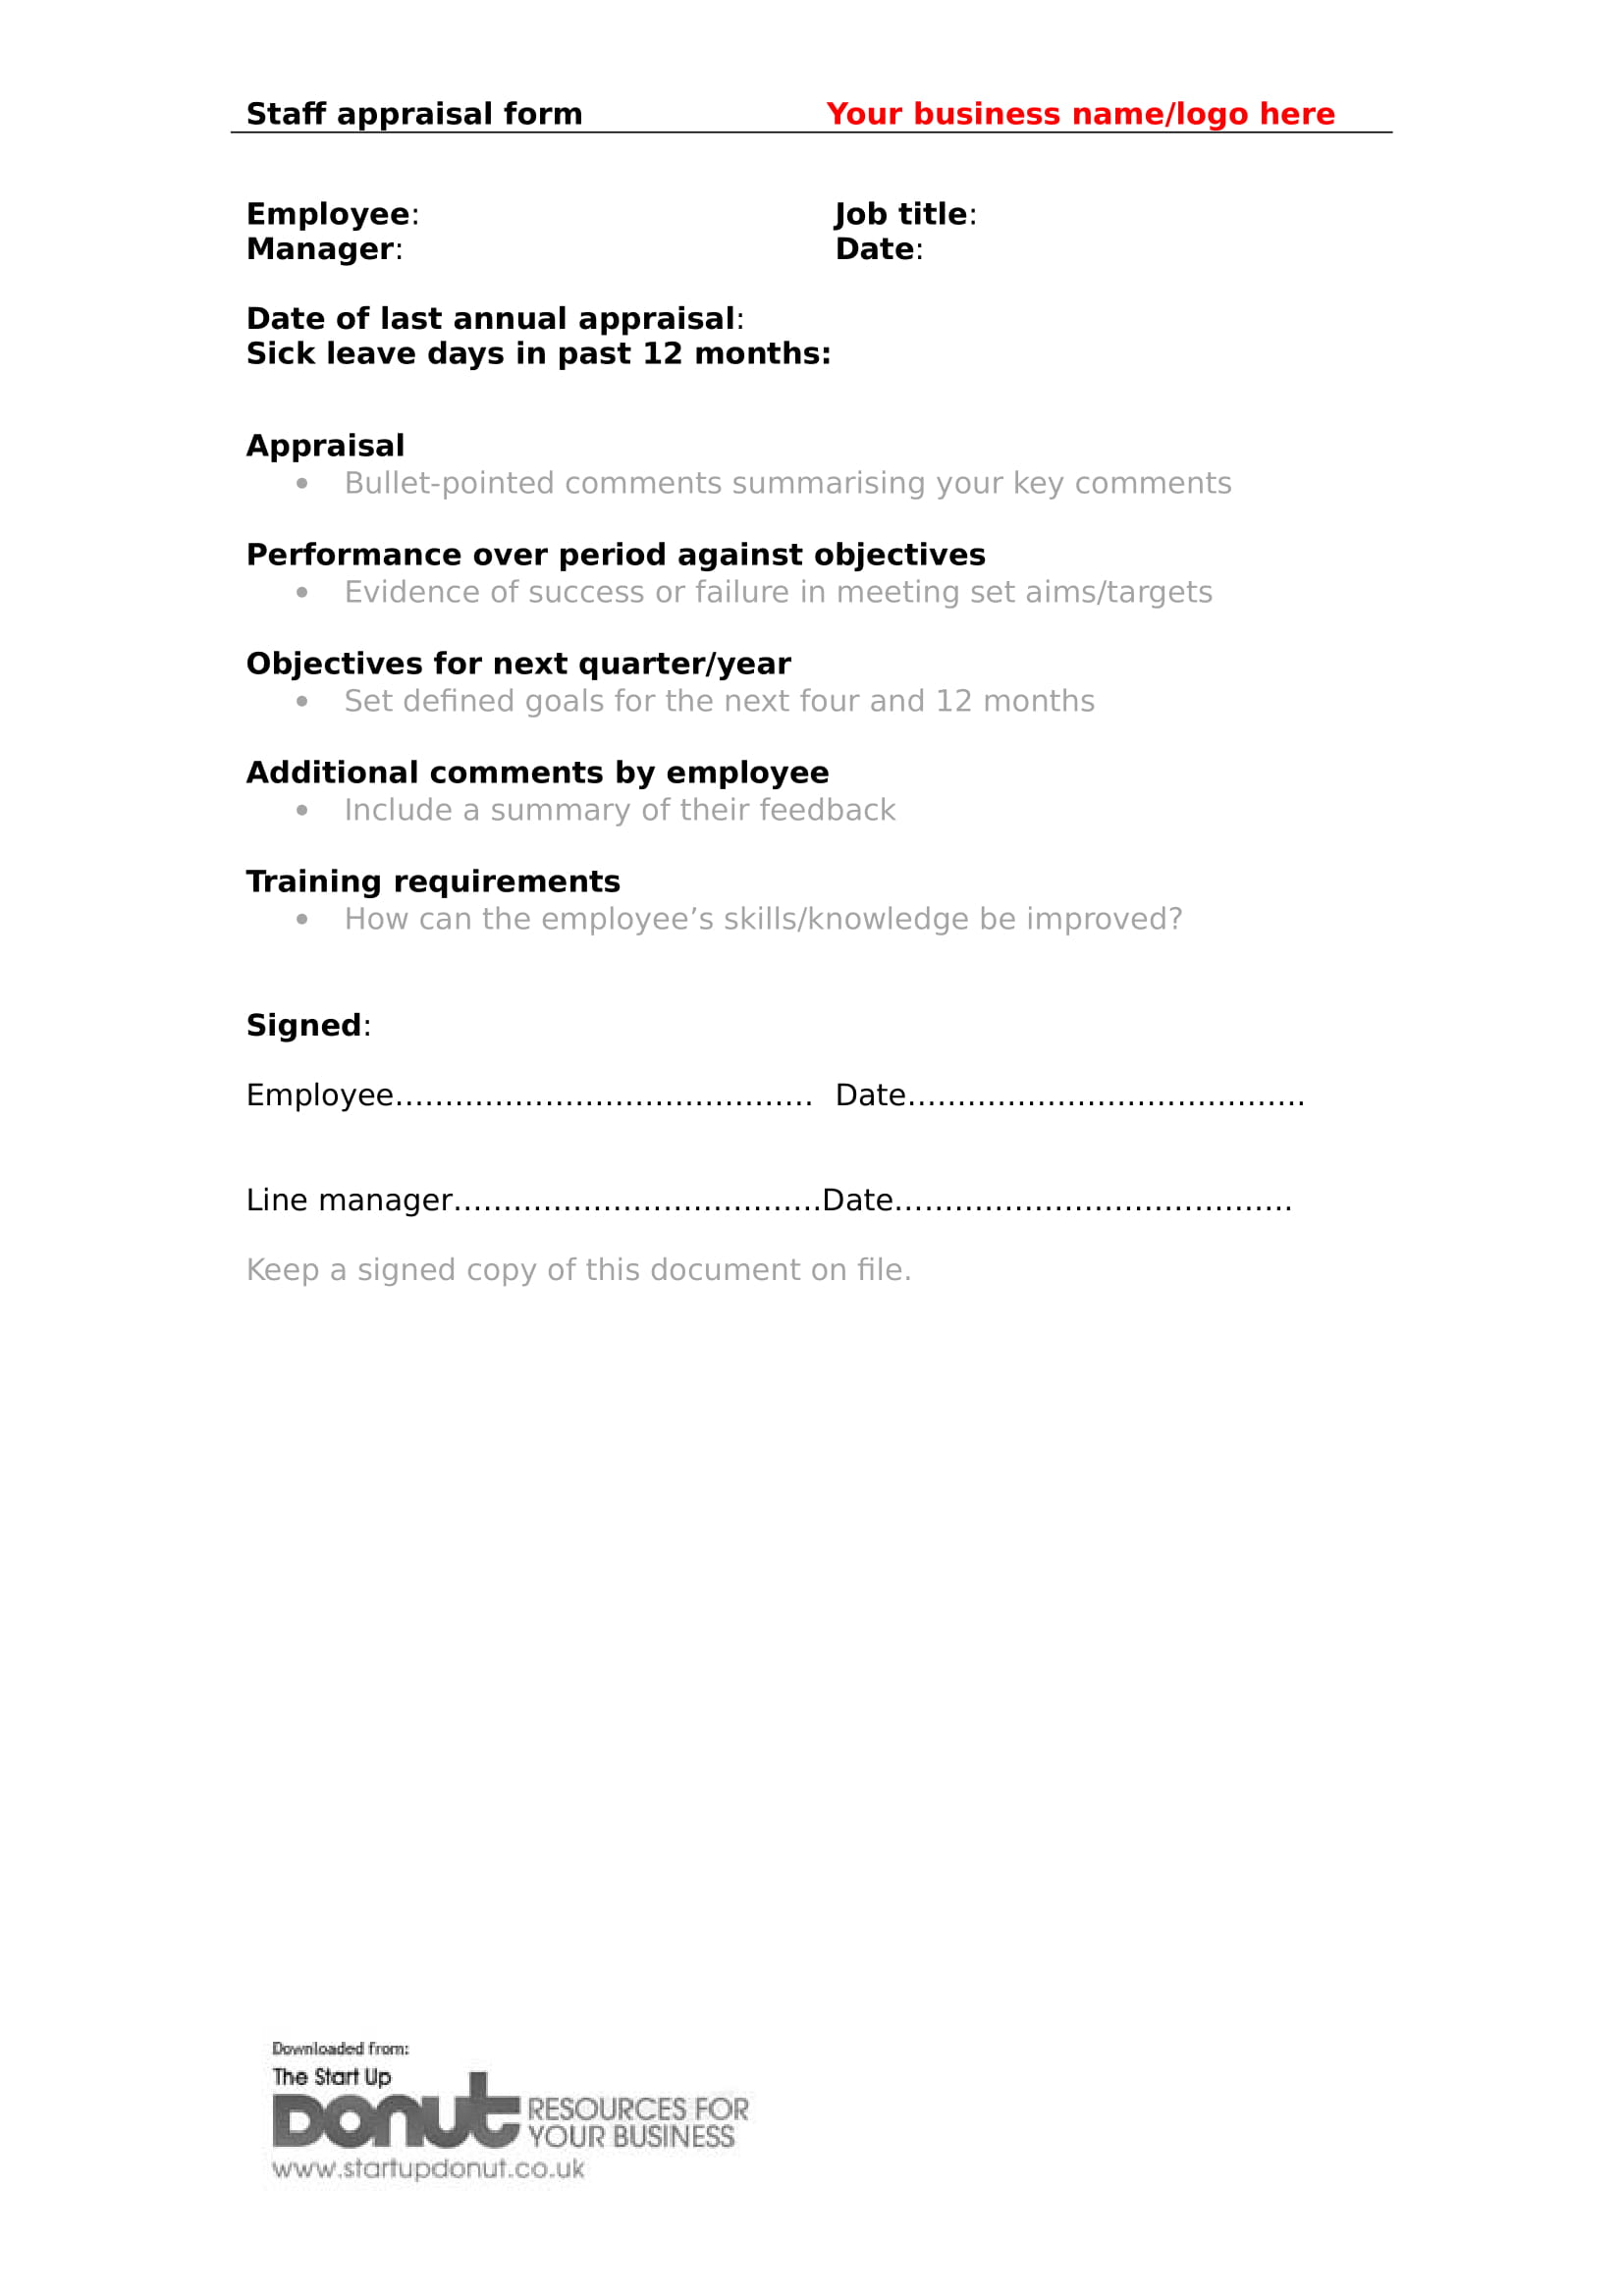 restaurant employee staff appraisal form 1